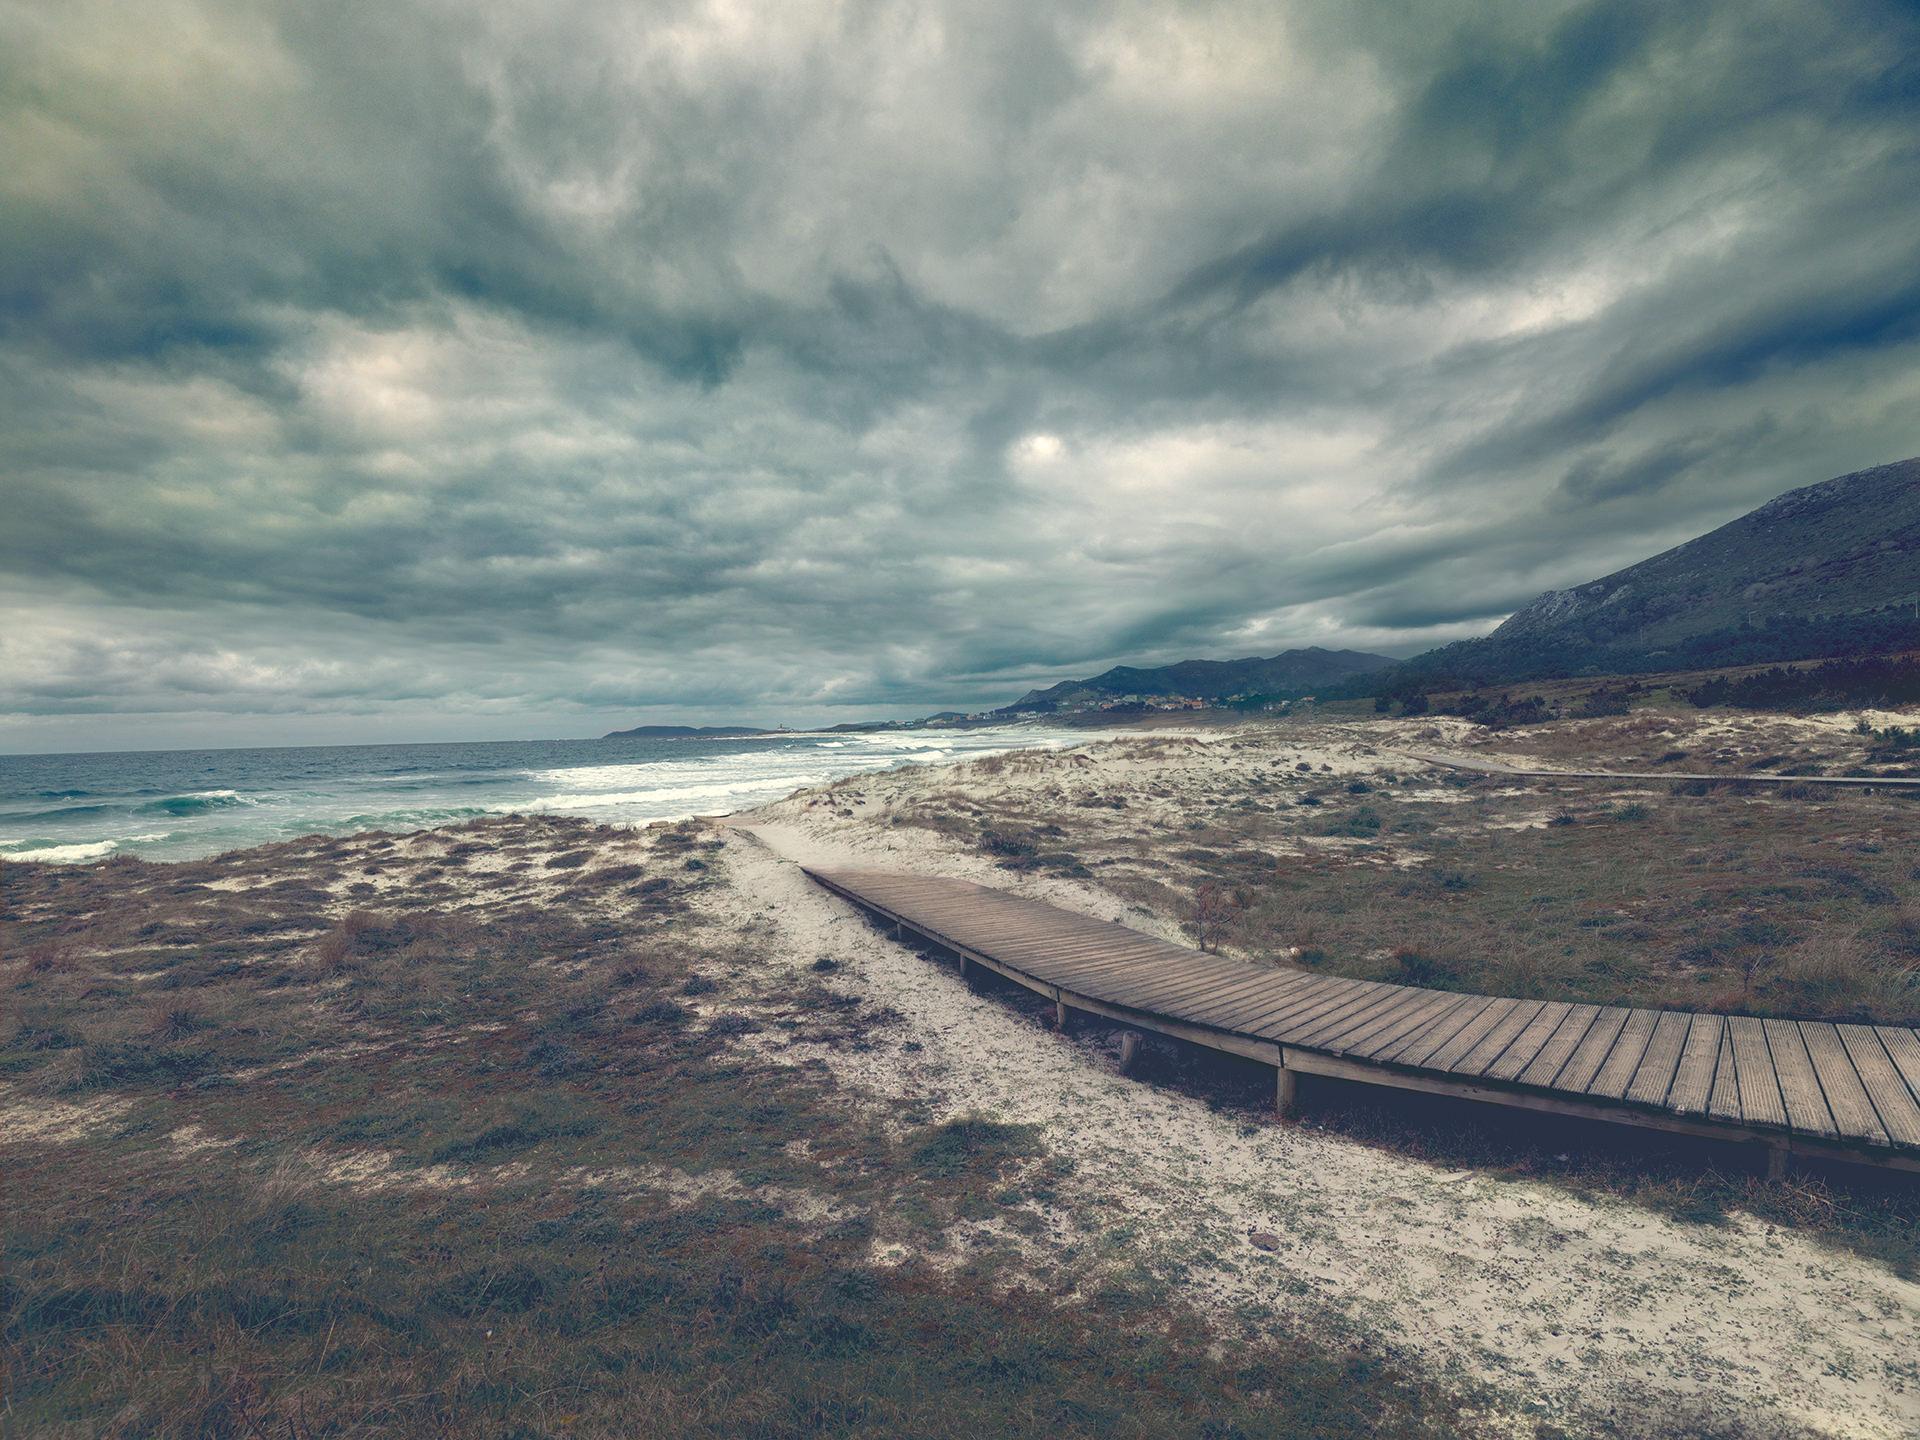 ©ankeluckmann1725, coast, galicia, green, landscape, rocks, spain, anke luckmann, www.ankeluckmann.com, beach